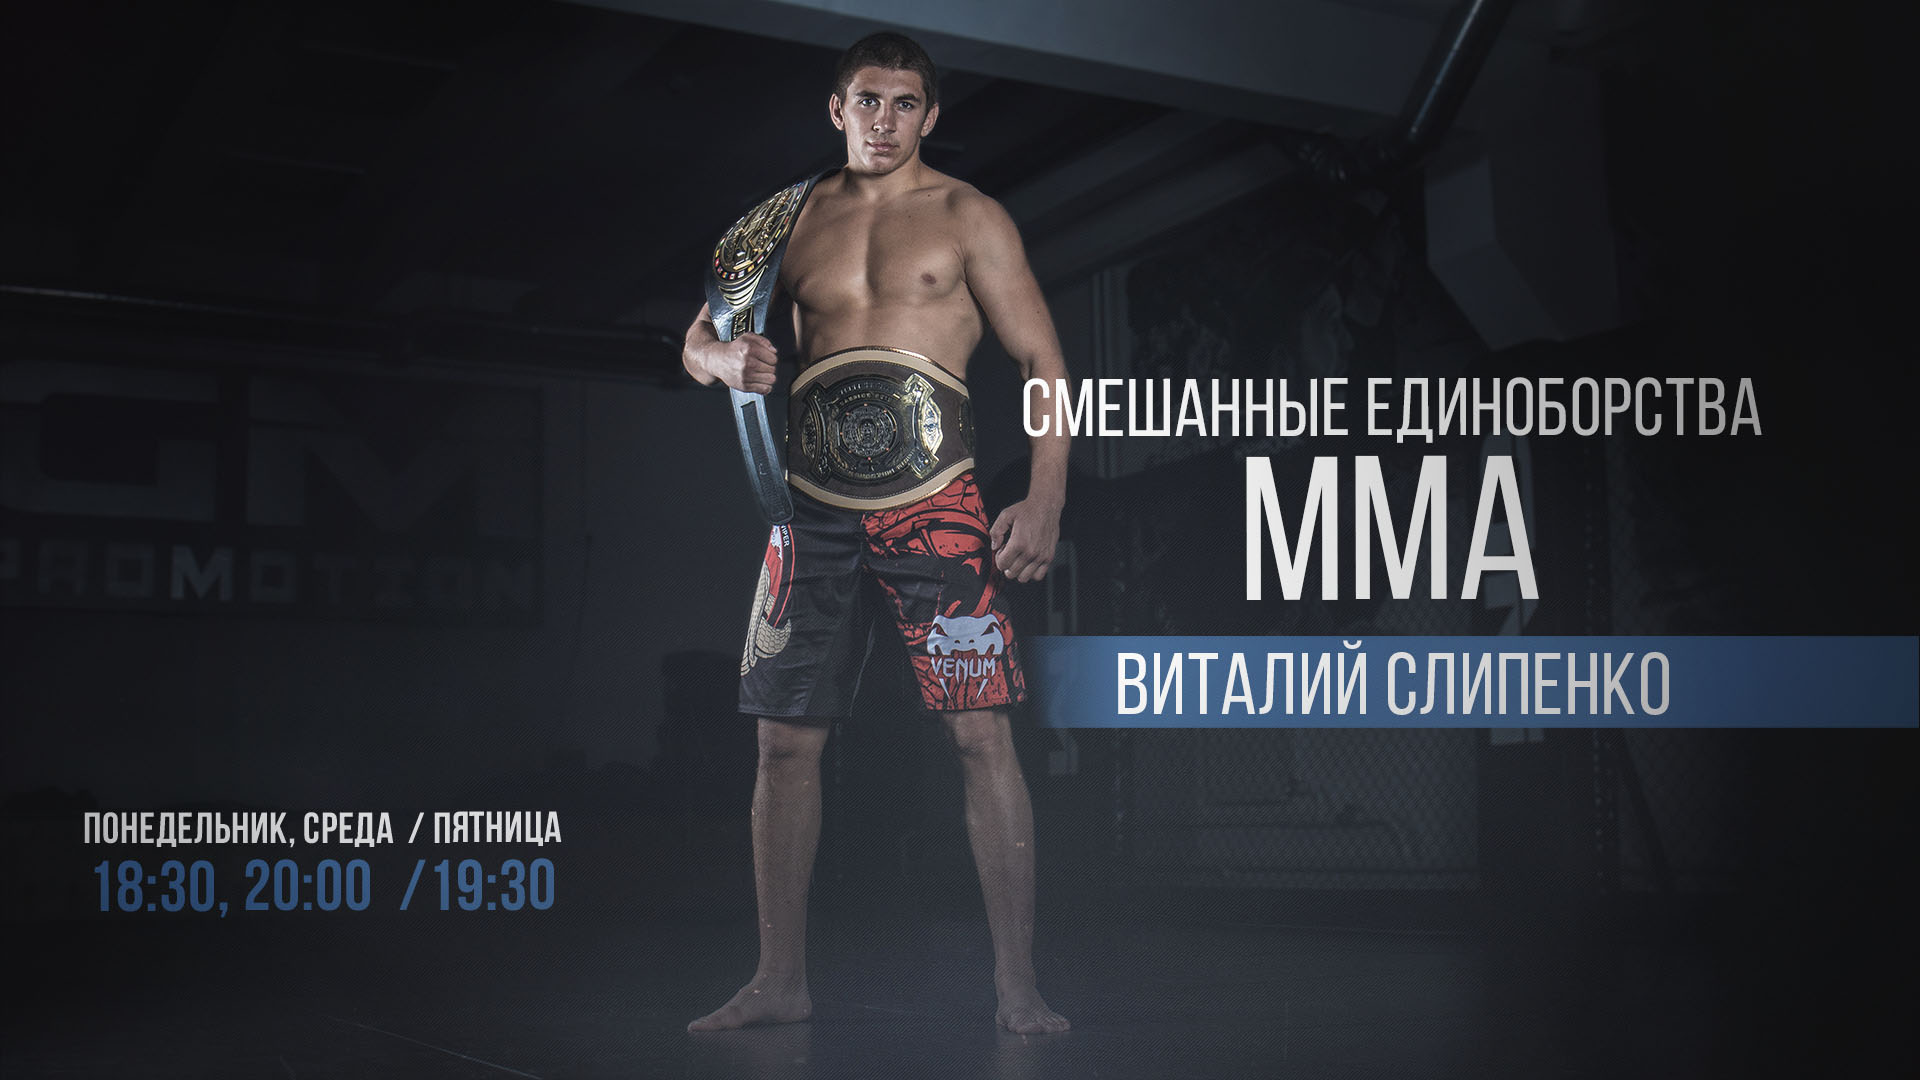 Виталий Слипенко тренер по ММА